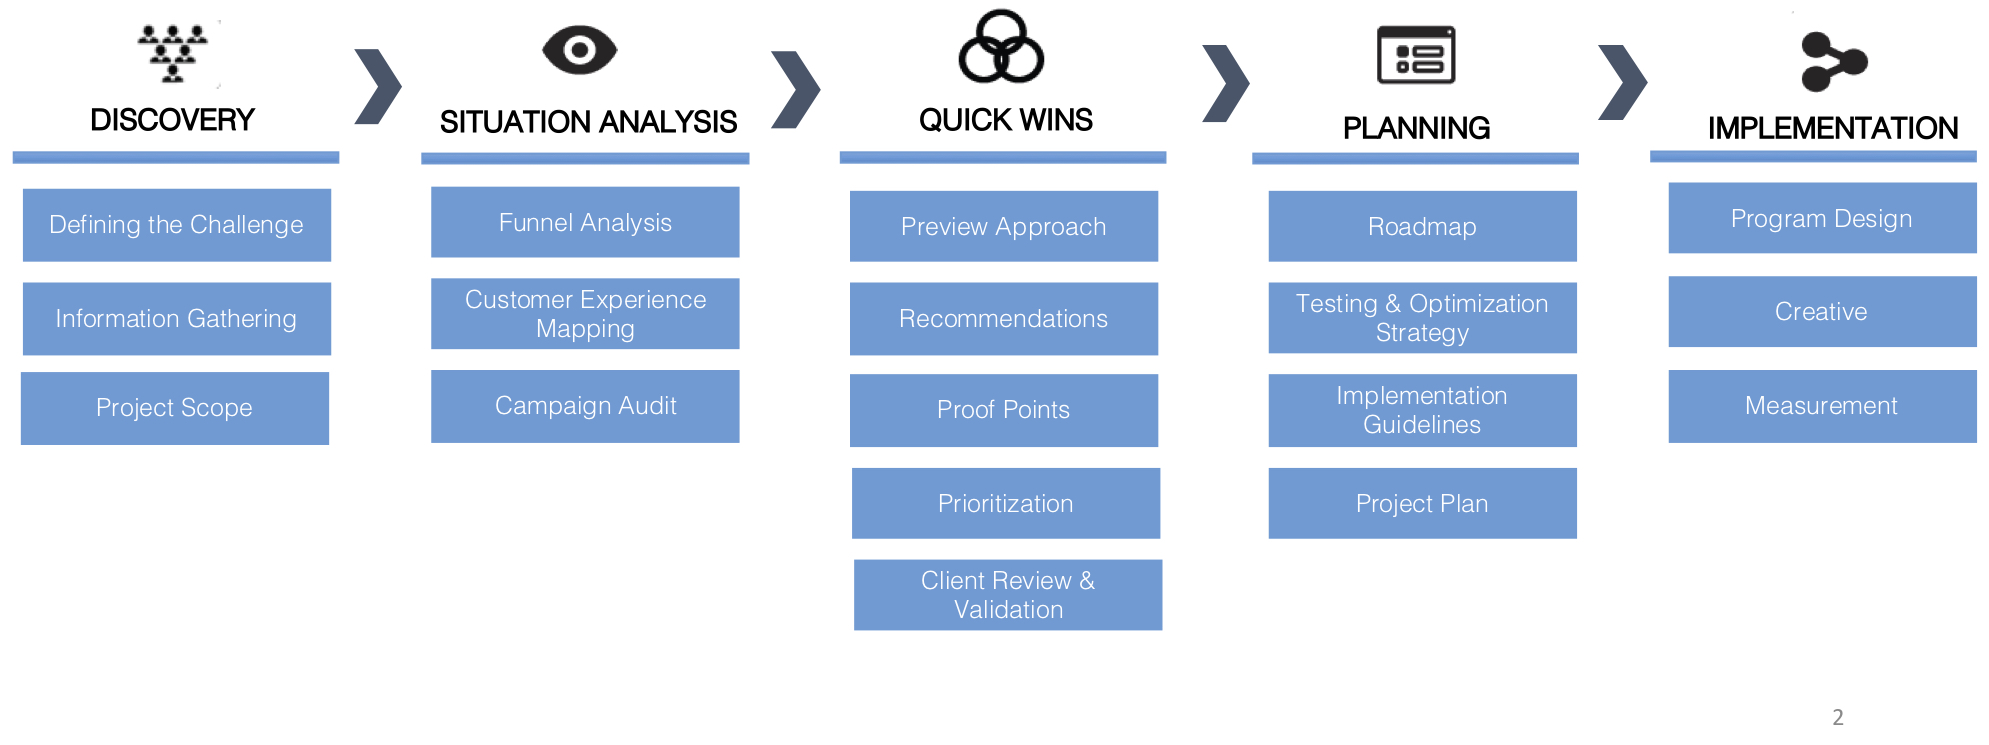 AgileCMO approach graphic.jpg